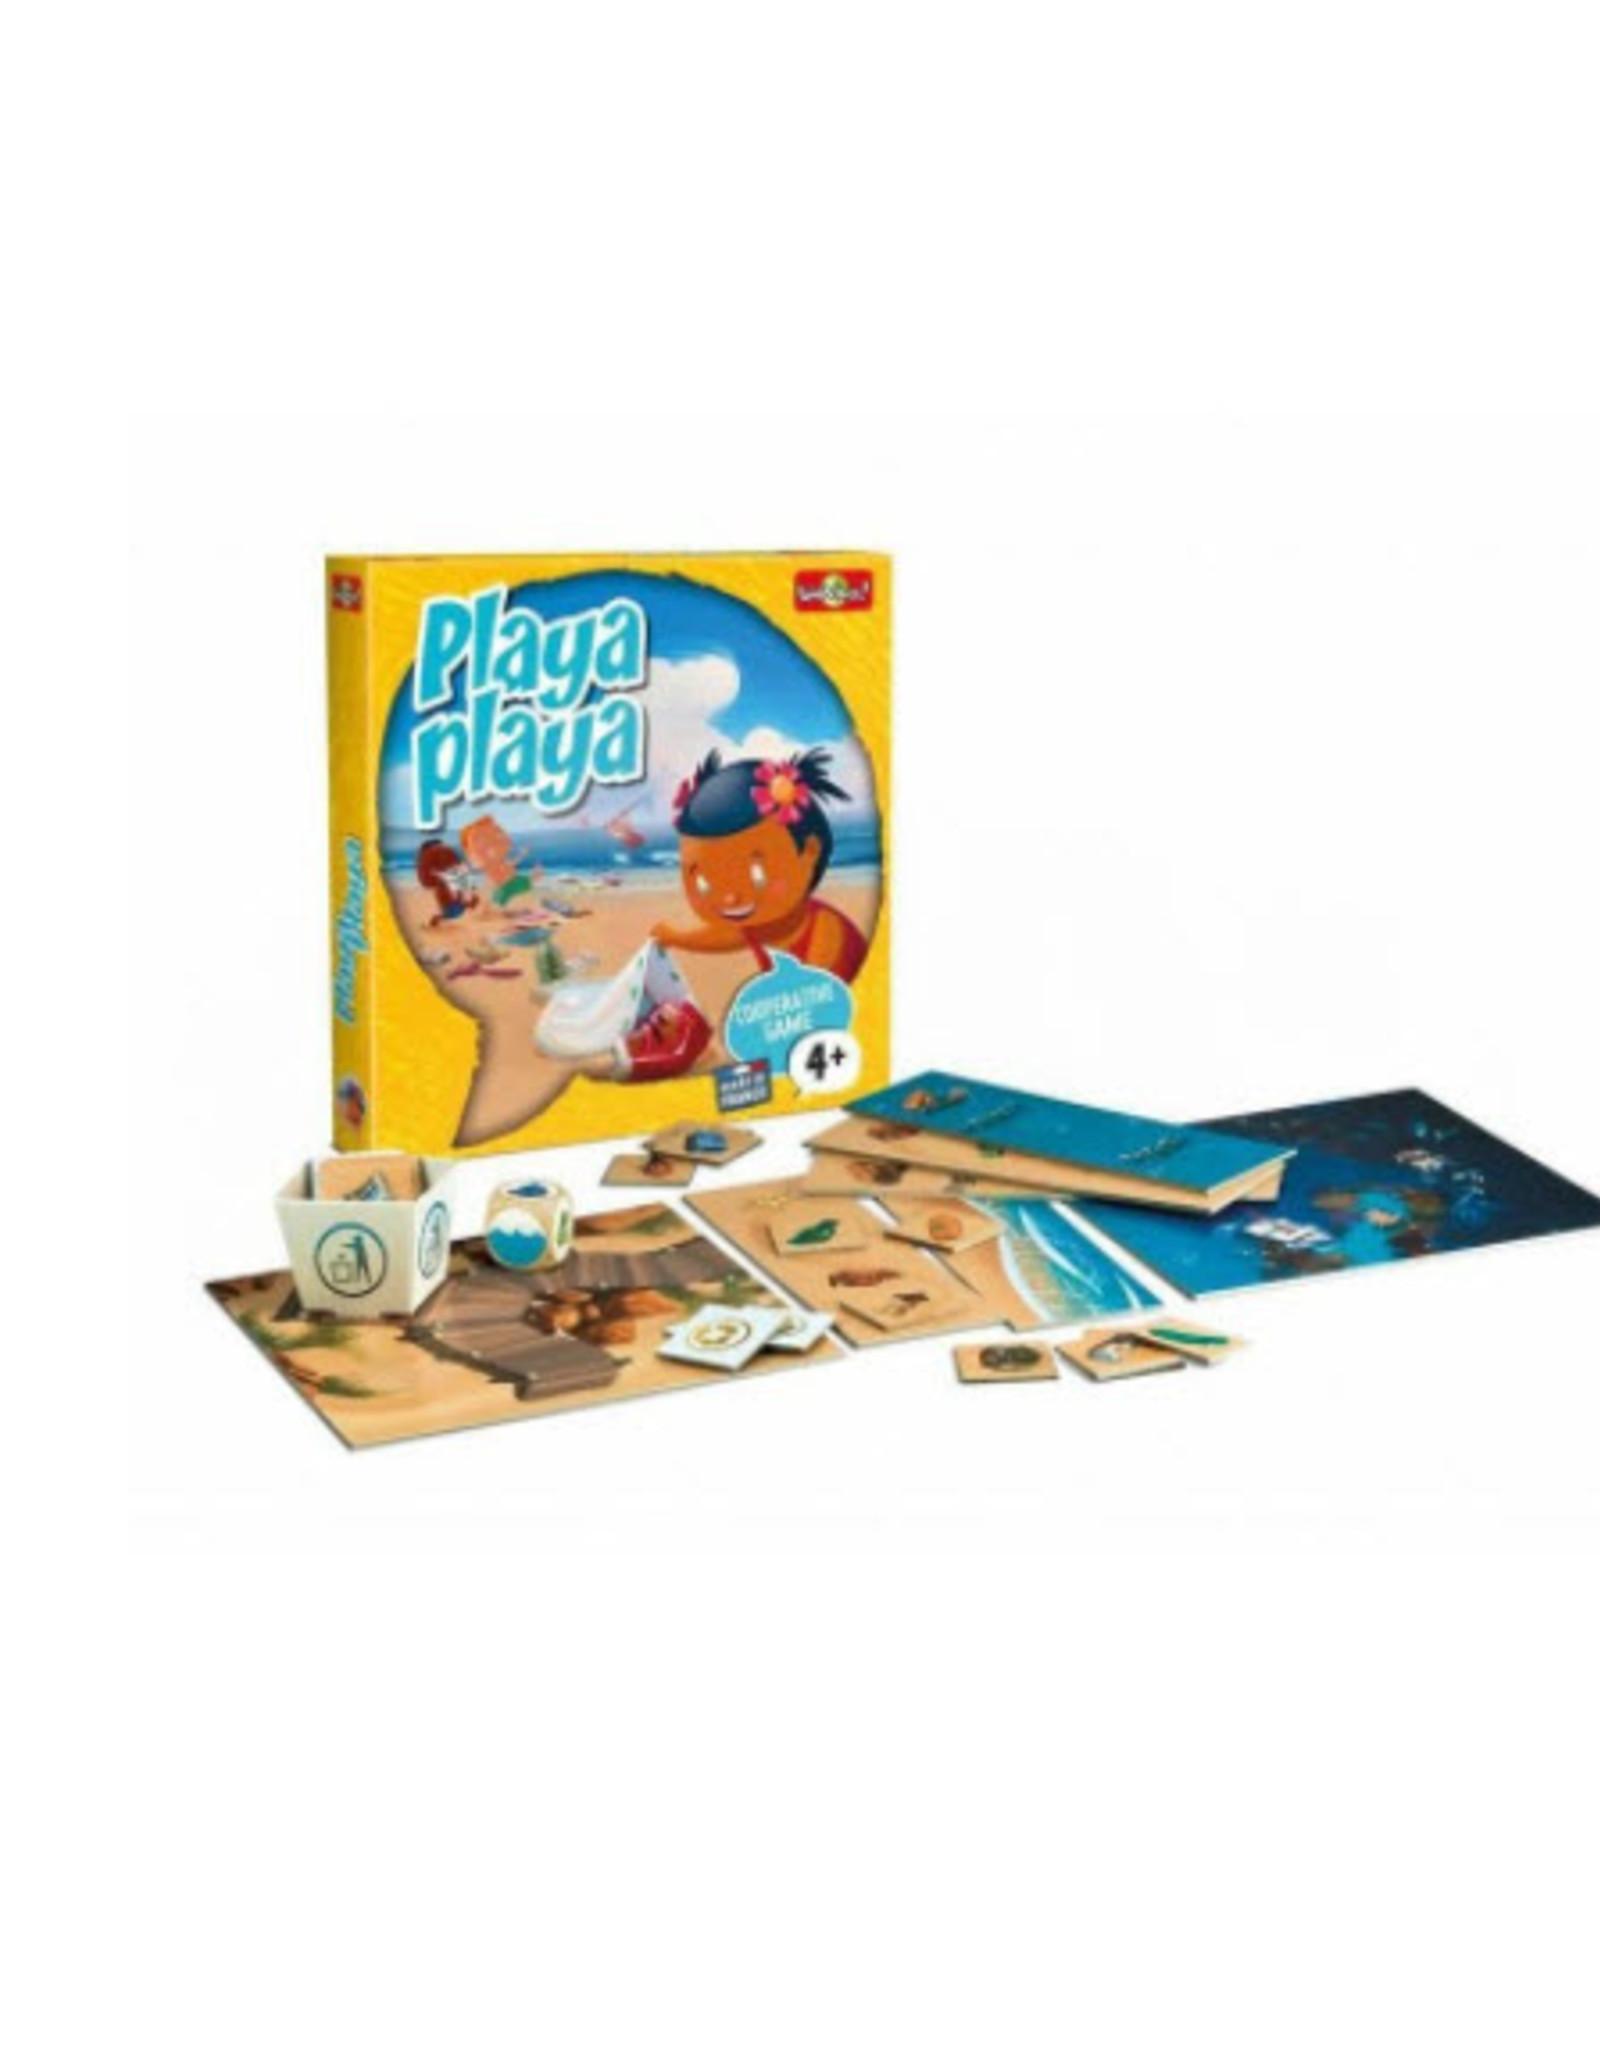 BioViva Spel Playa Playa 4+